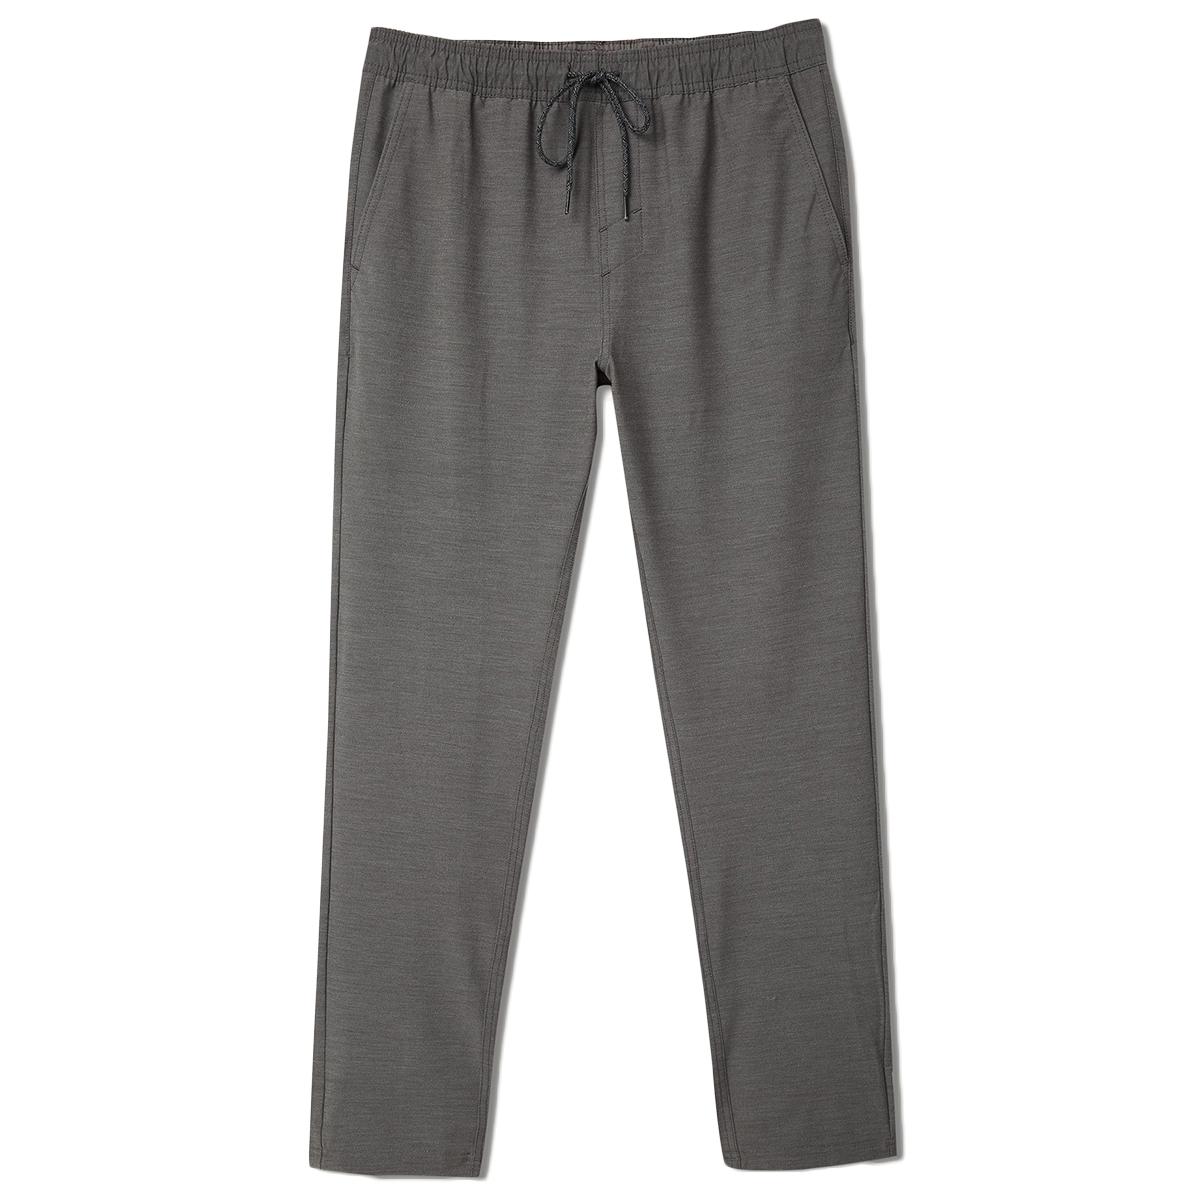 O'neill Men's Indolands Hybrid Pants - Black, L